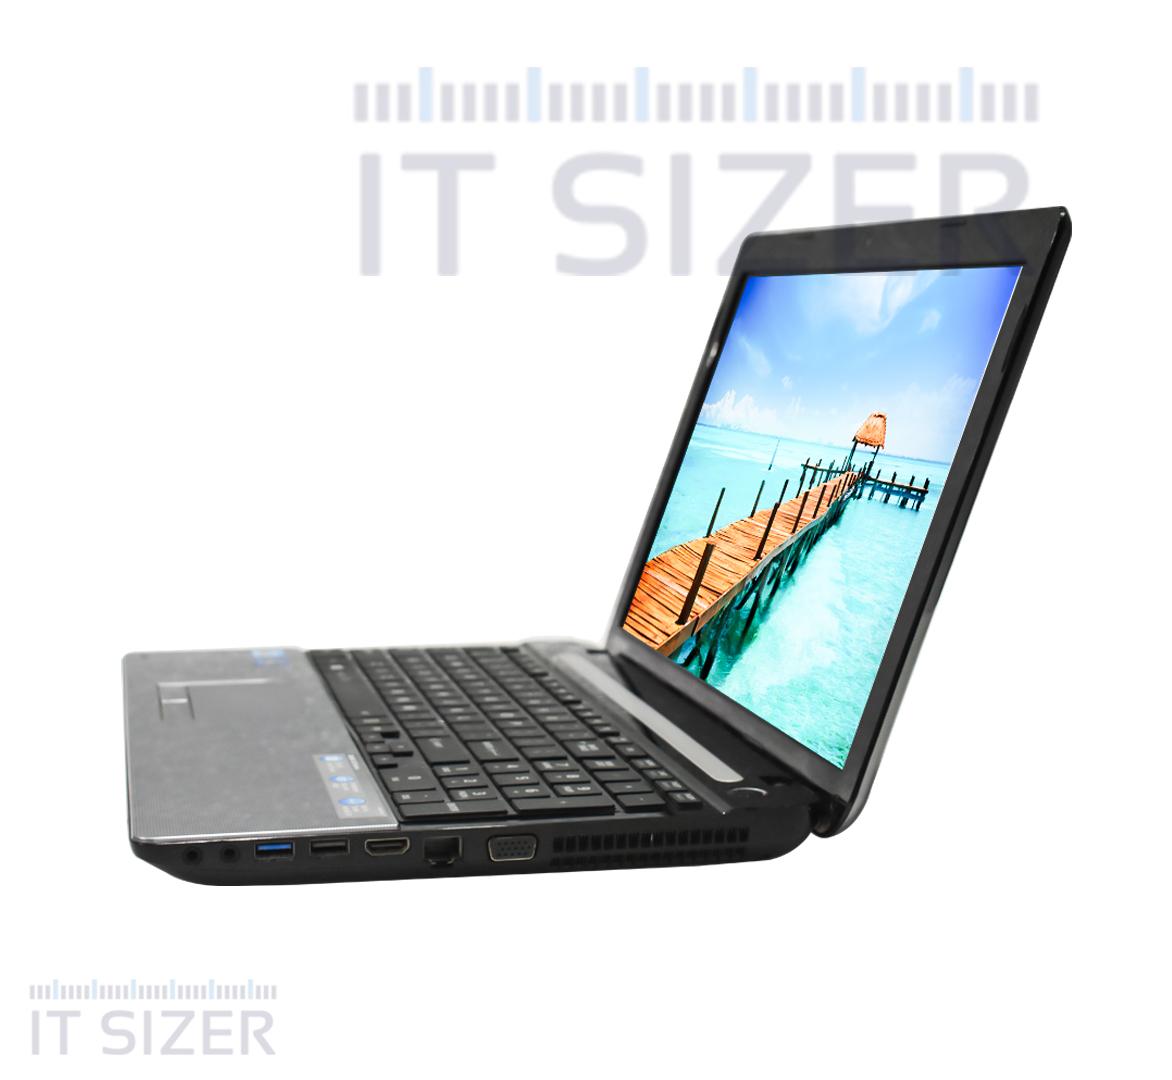 Toshiba Satellite C55-A5195 Business Laptop, Intel Core i3-3110M CPU, 4GB DDR3L SODIMM RAM, 320GB SATA 2.5 Hard, 15 inch Display, Windows 10 Pro (Renewed)